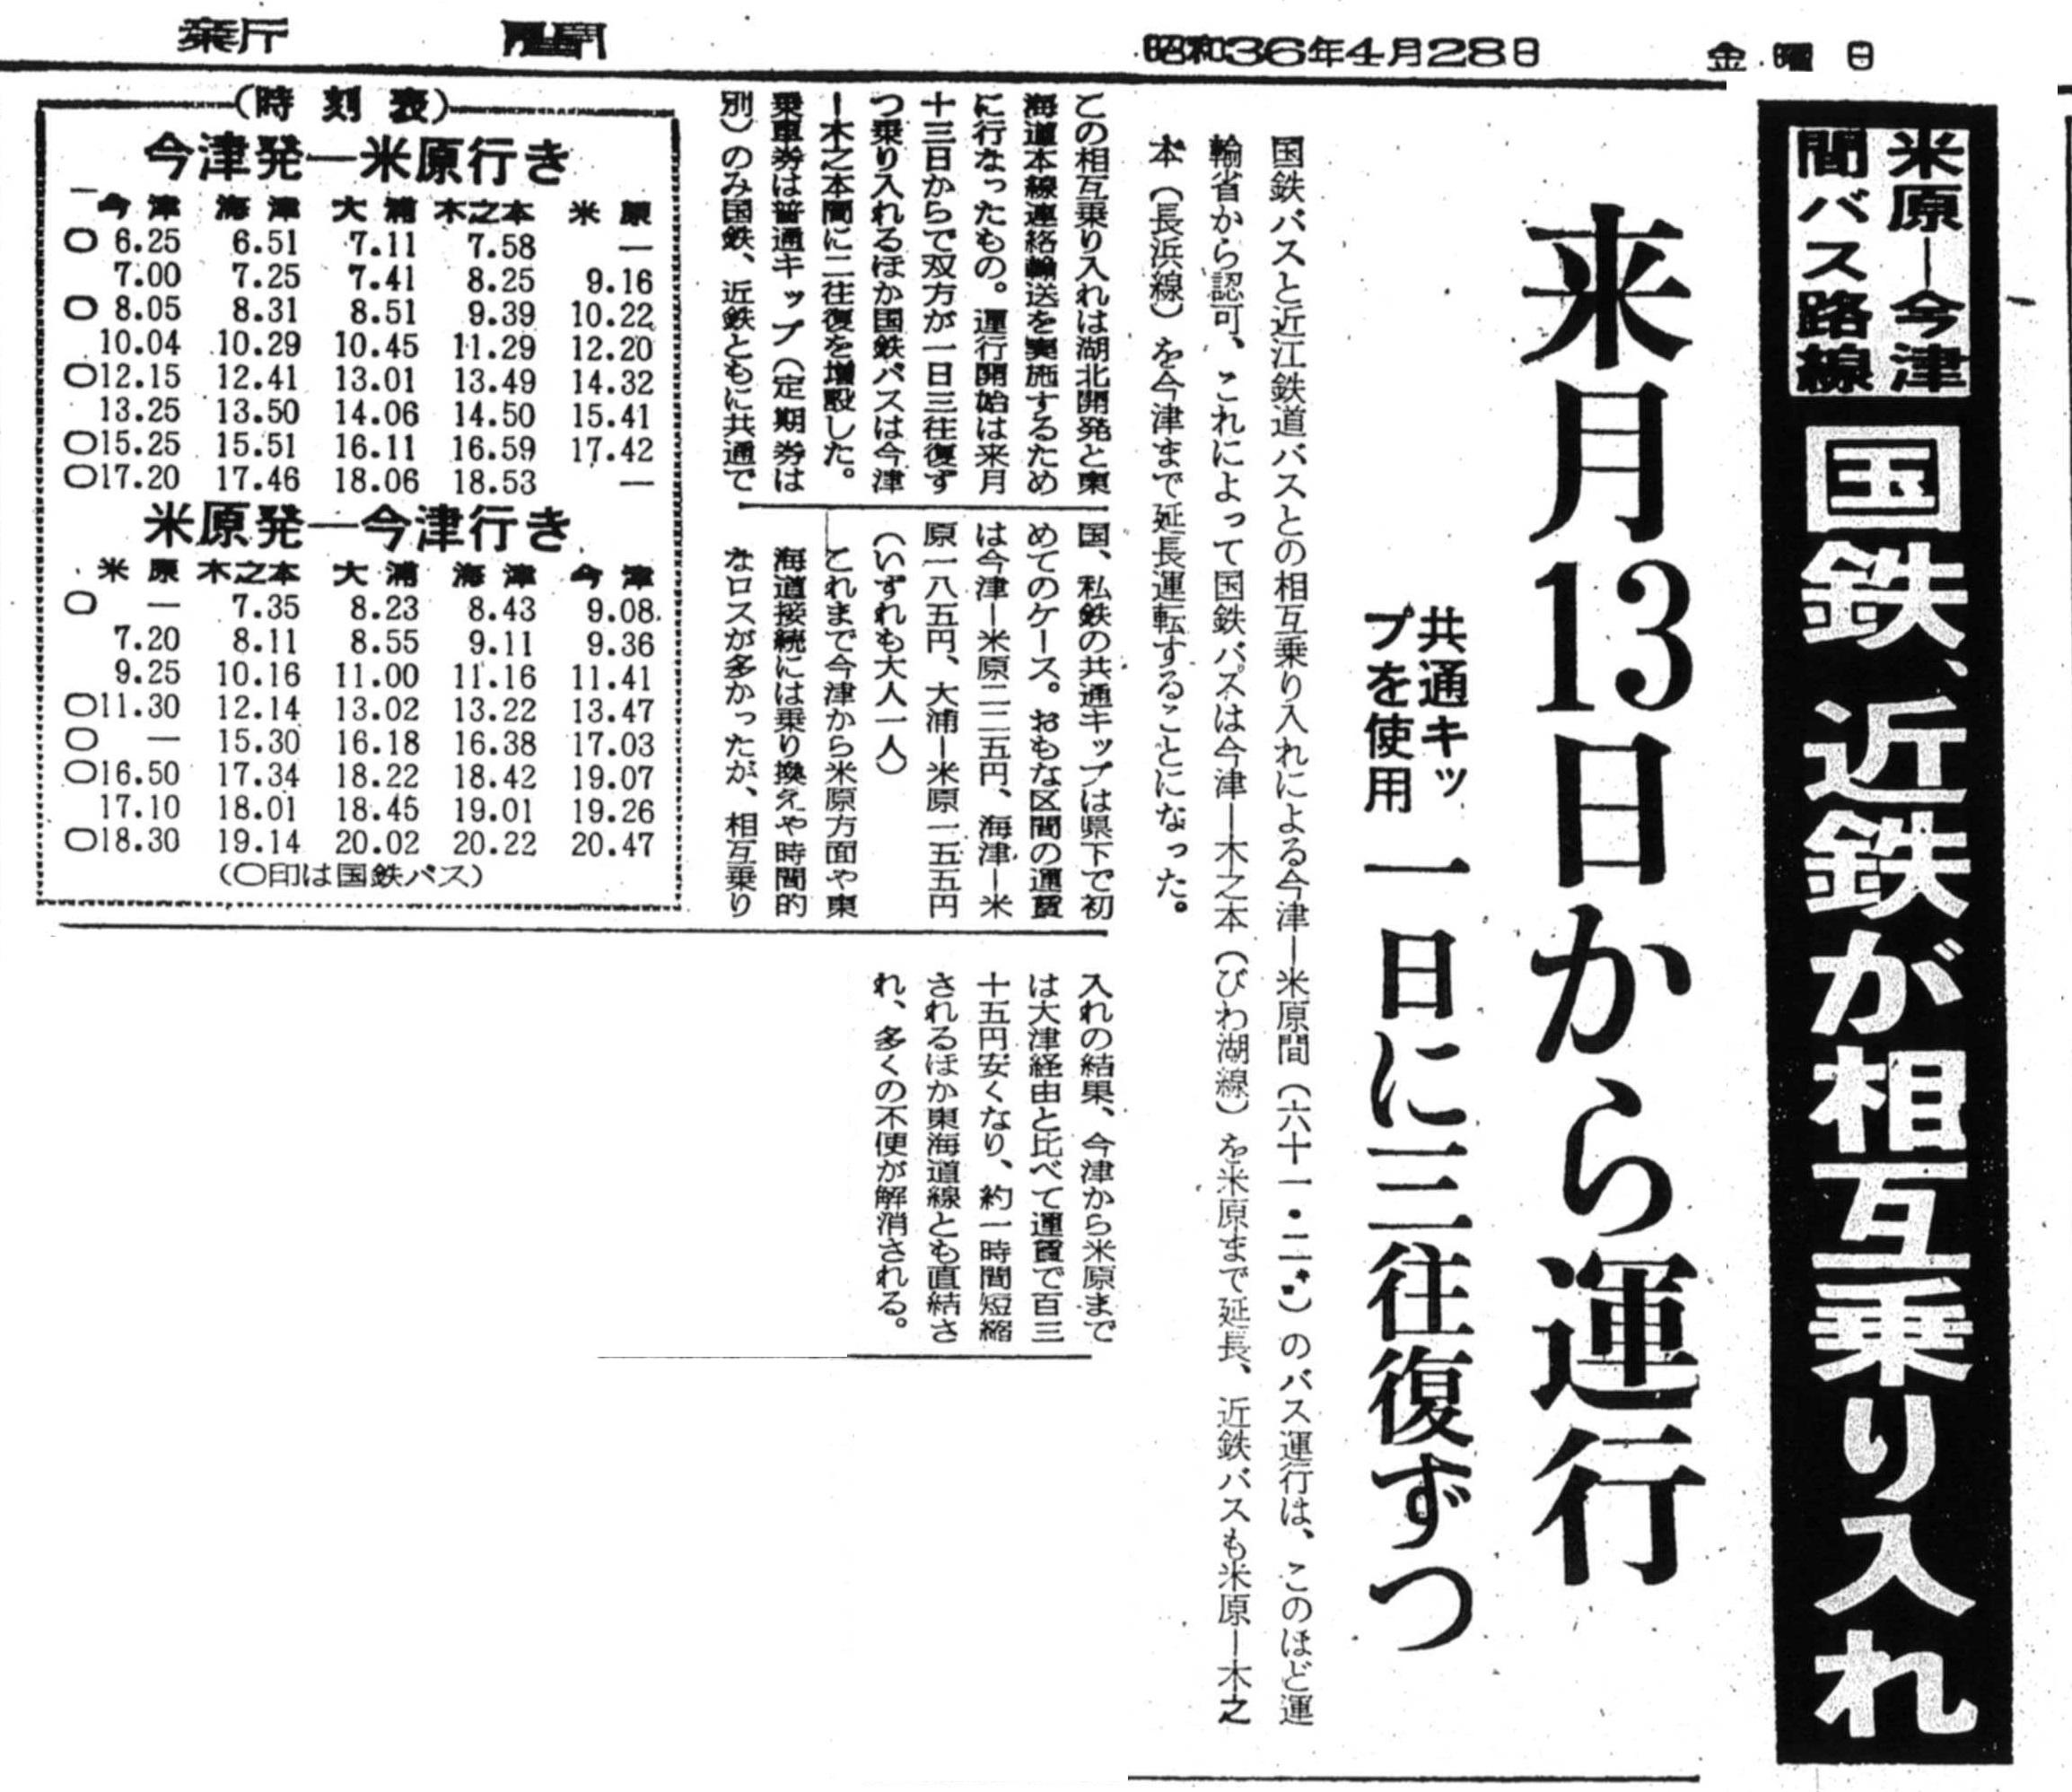 S36.4.28K1S 米原今津間国鉄・近江相互乗り入れb